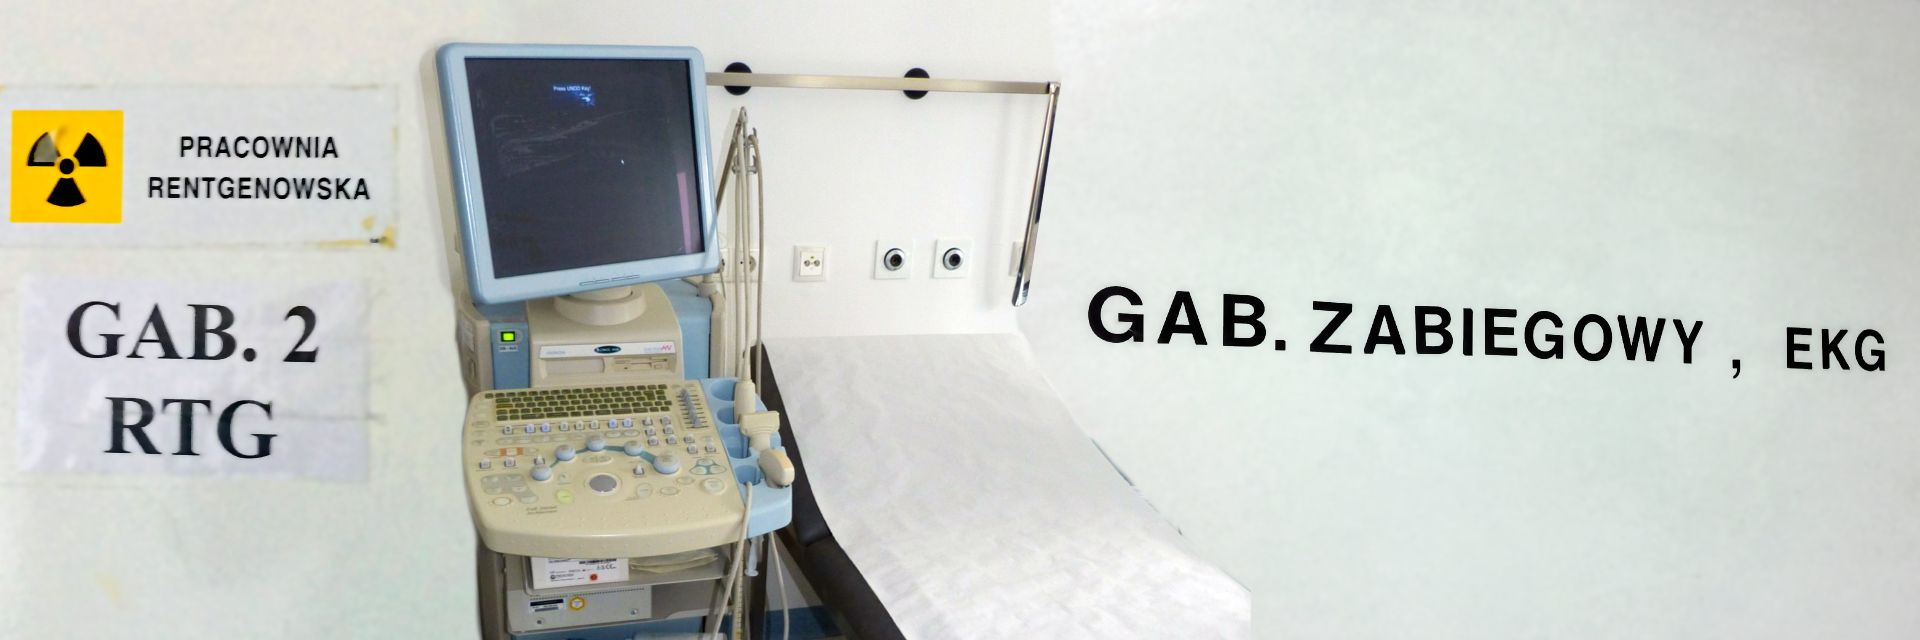 Badania RTG USG EKG